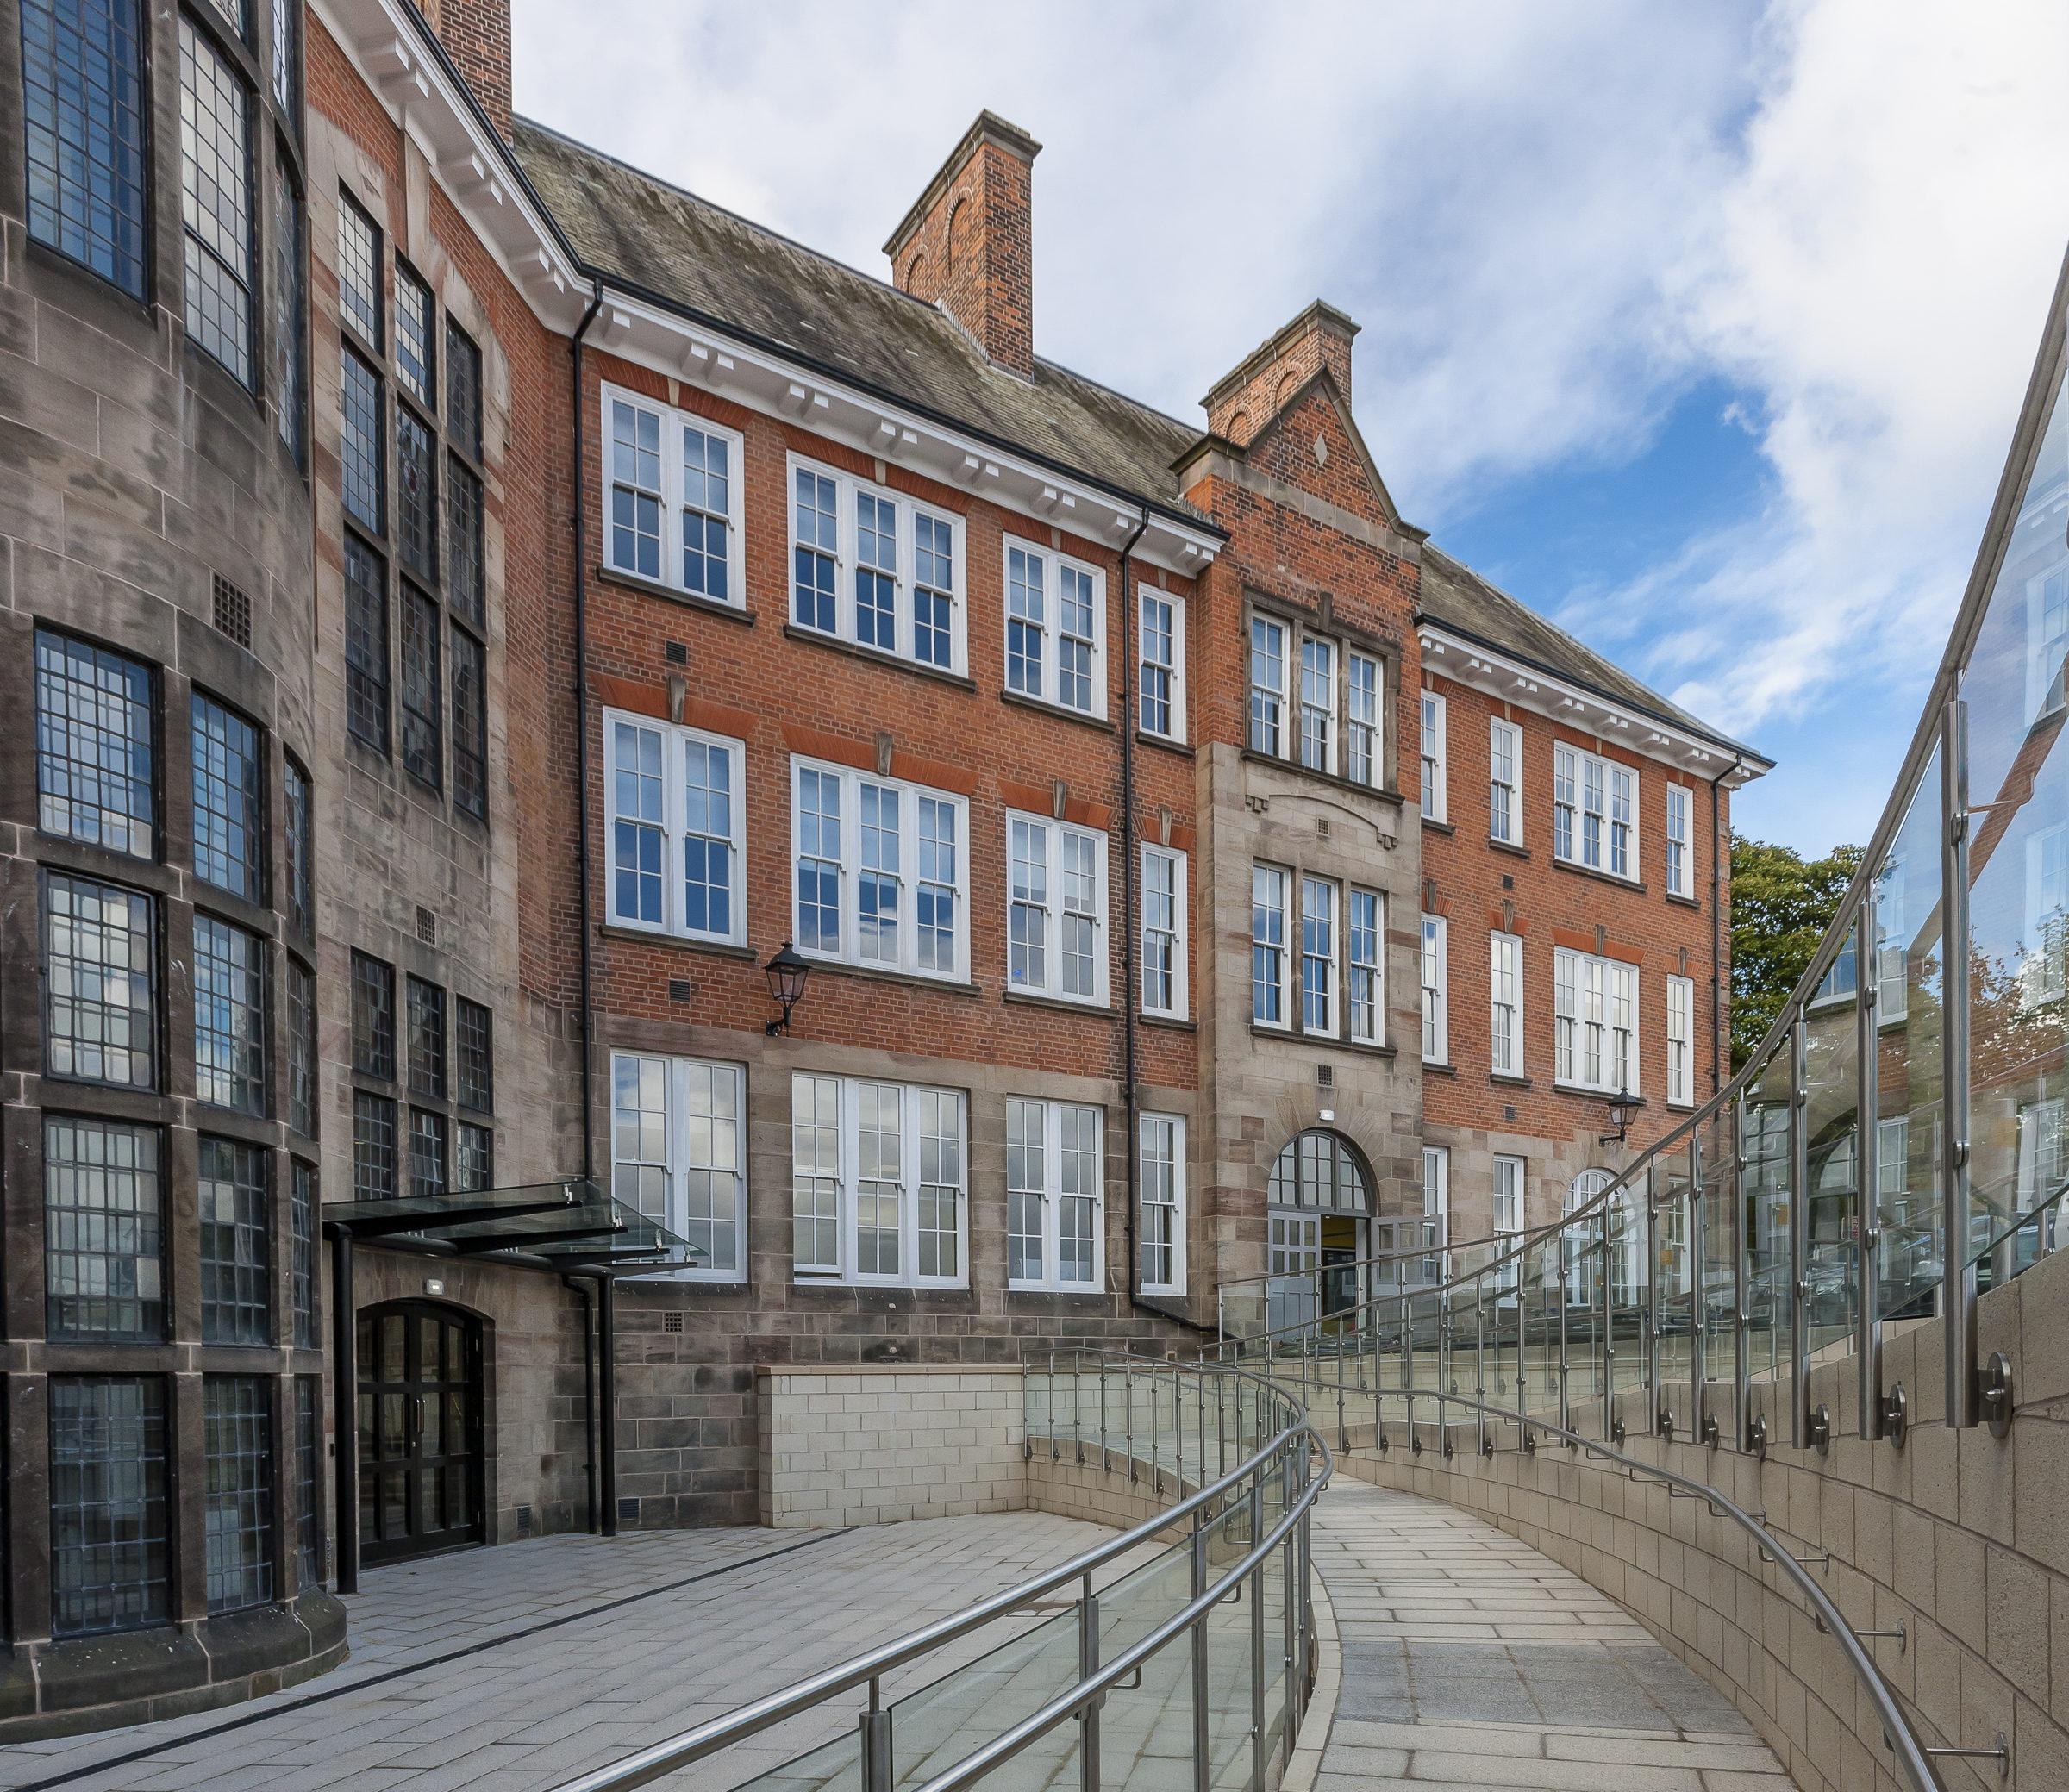 Amazon Property Bolsover Street Development - St helena campus chesterfield